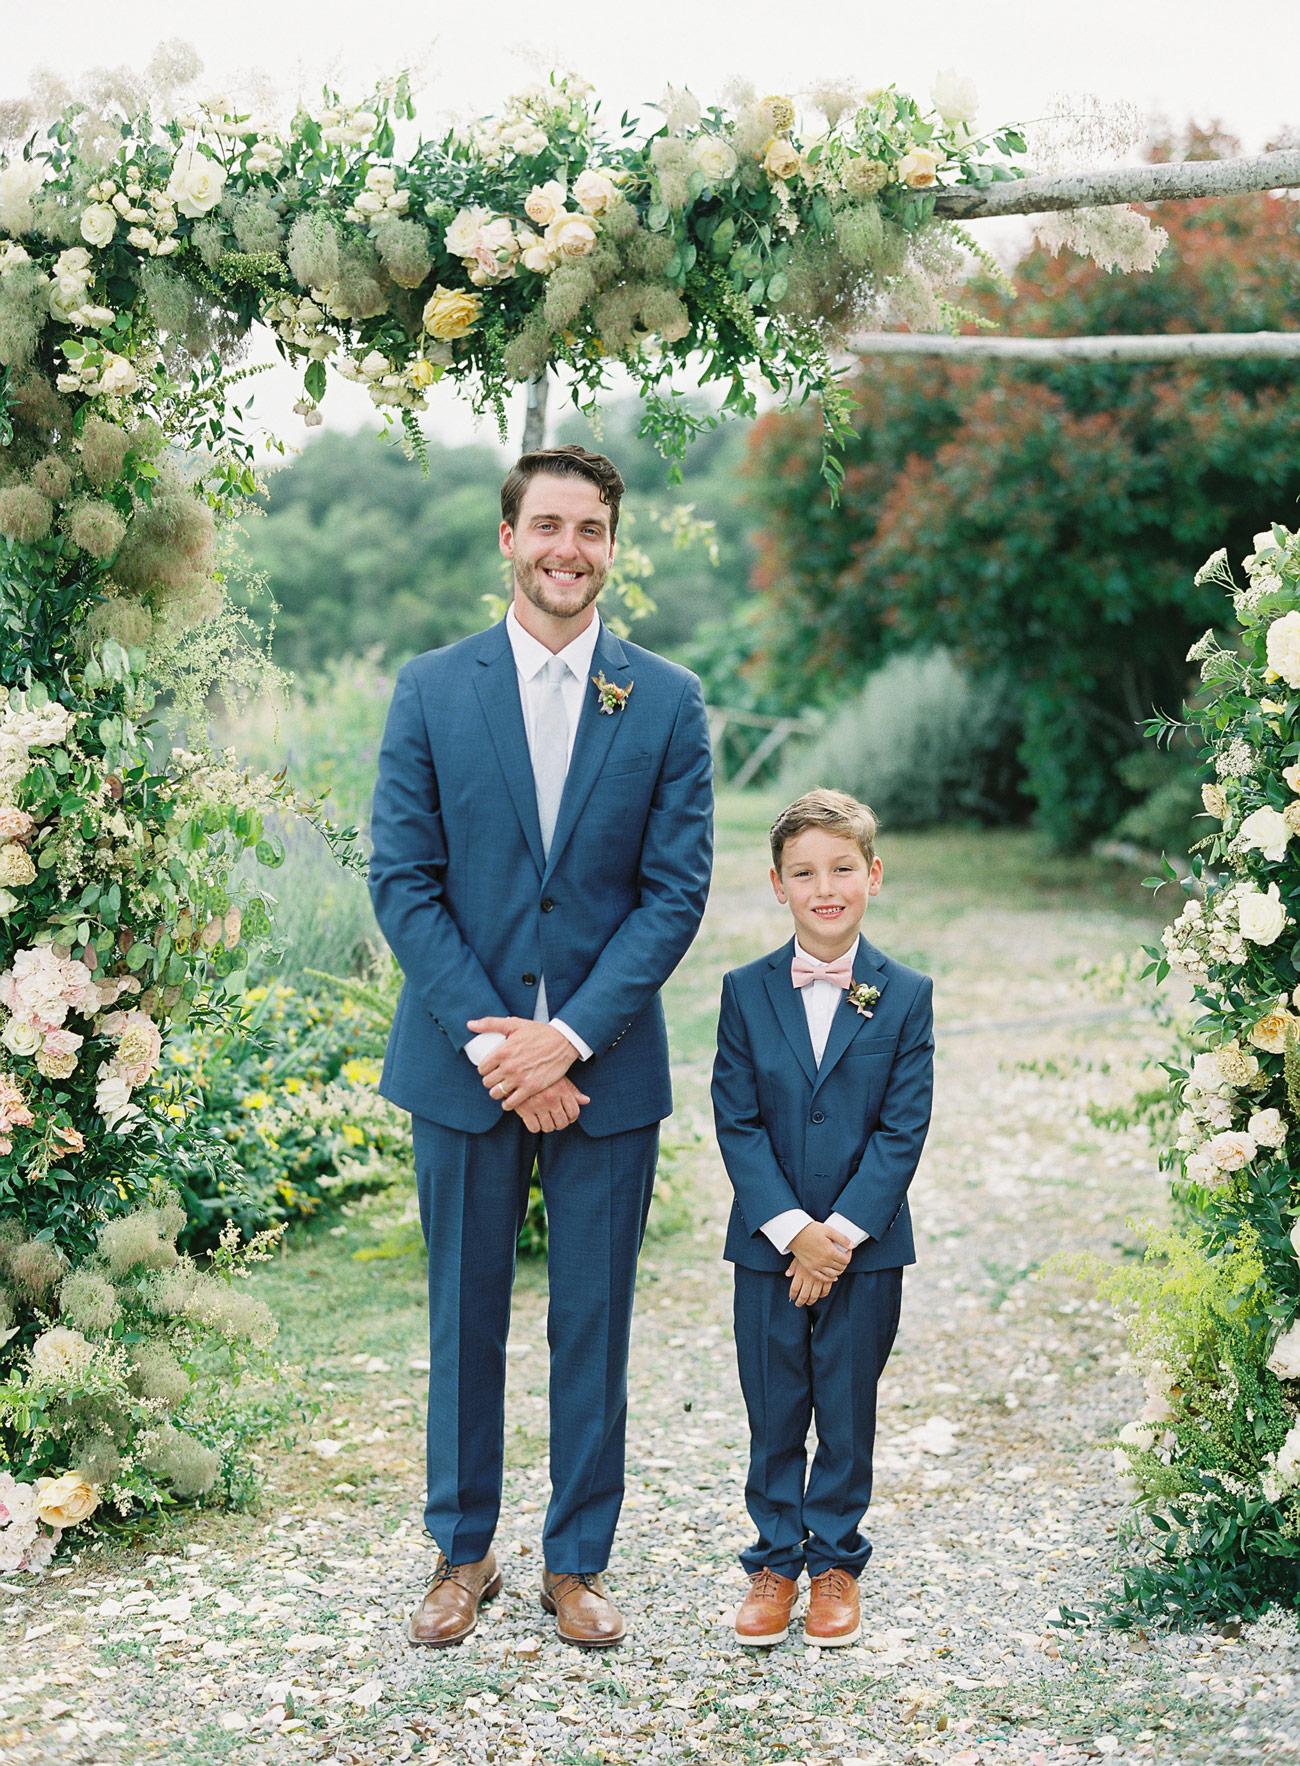 outdoor portrait groom and ring bearer